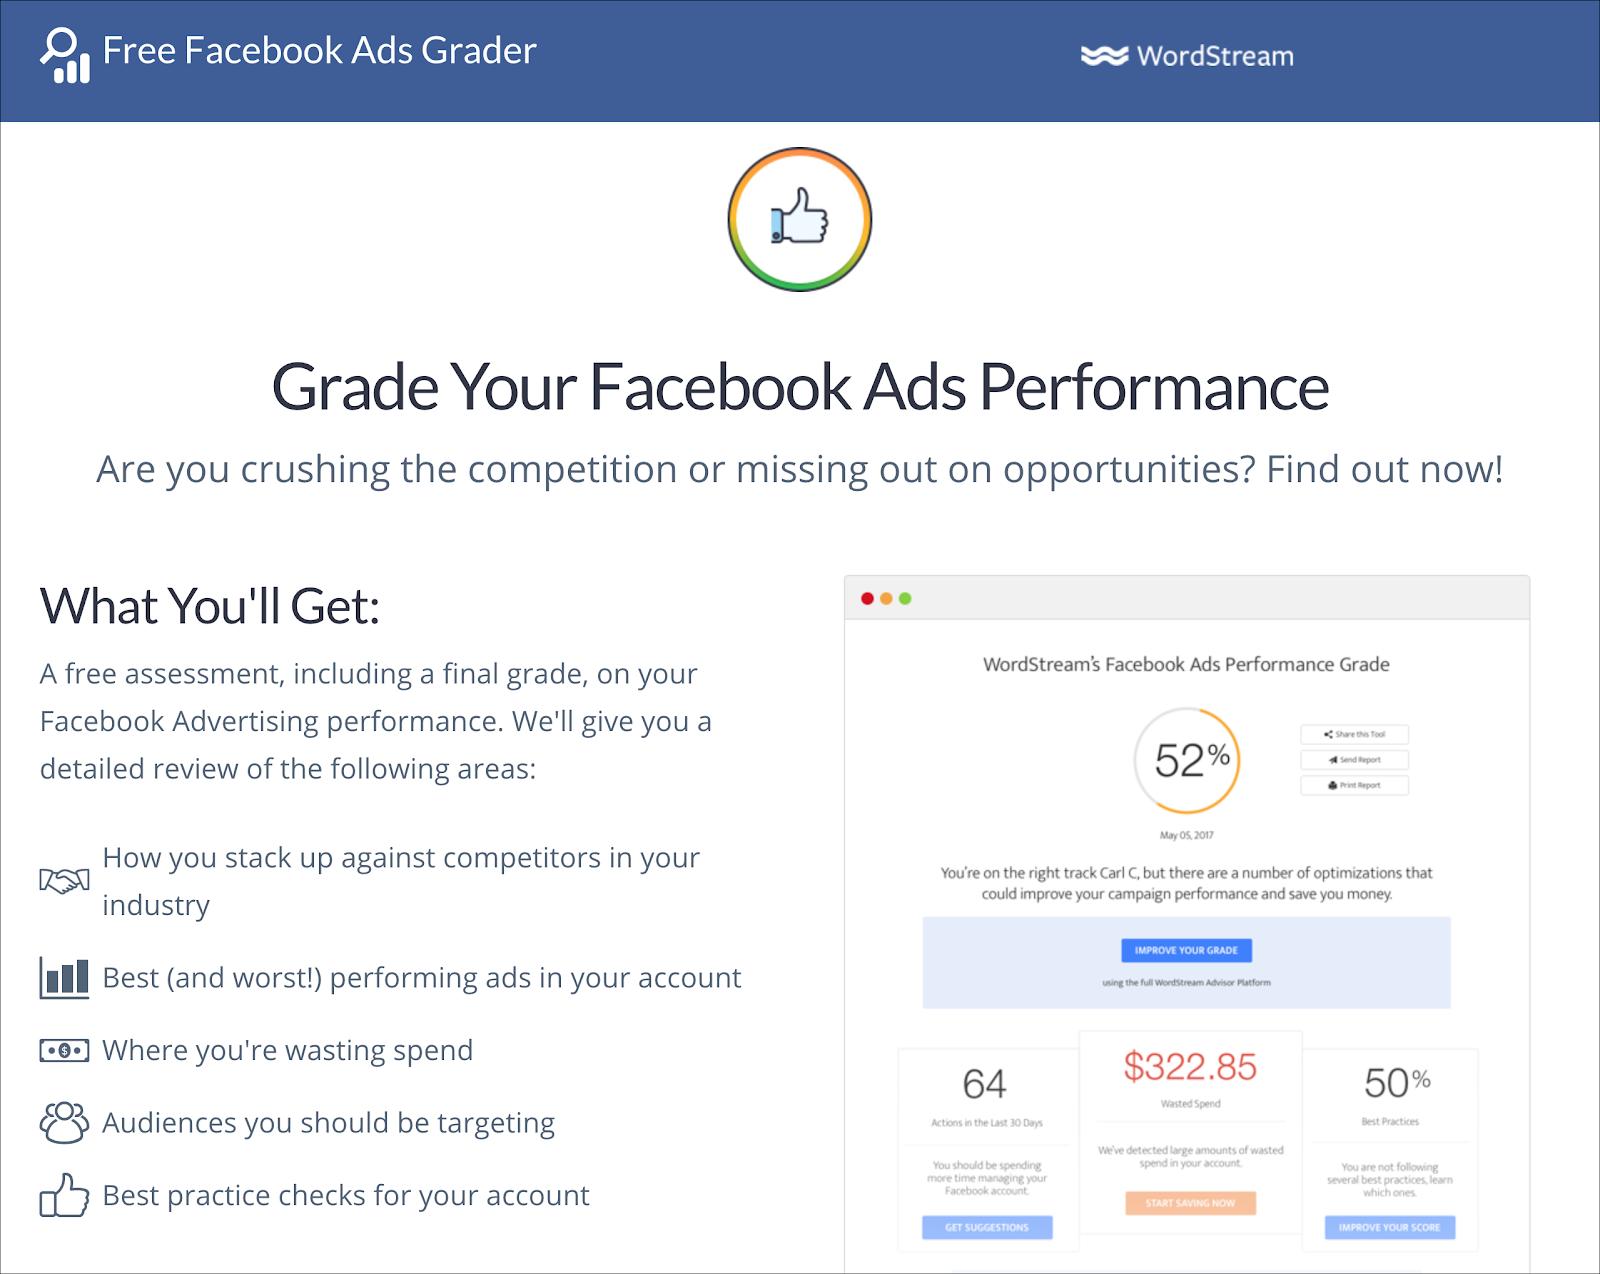 Wordstream Facebook Ads Grader